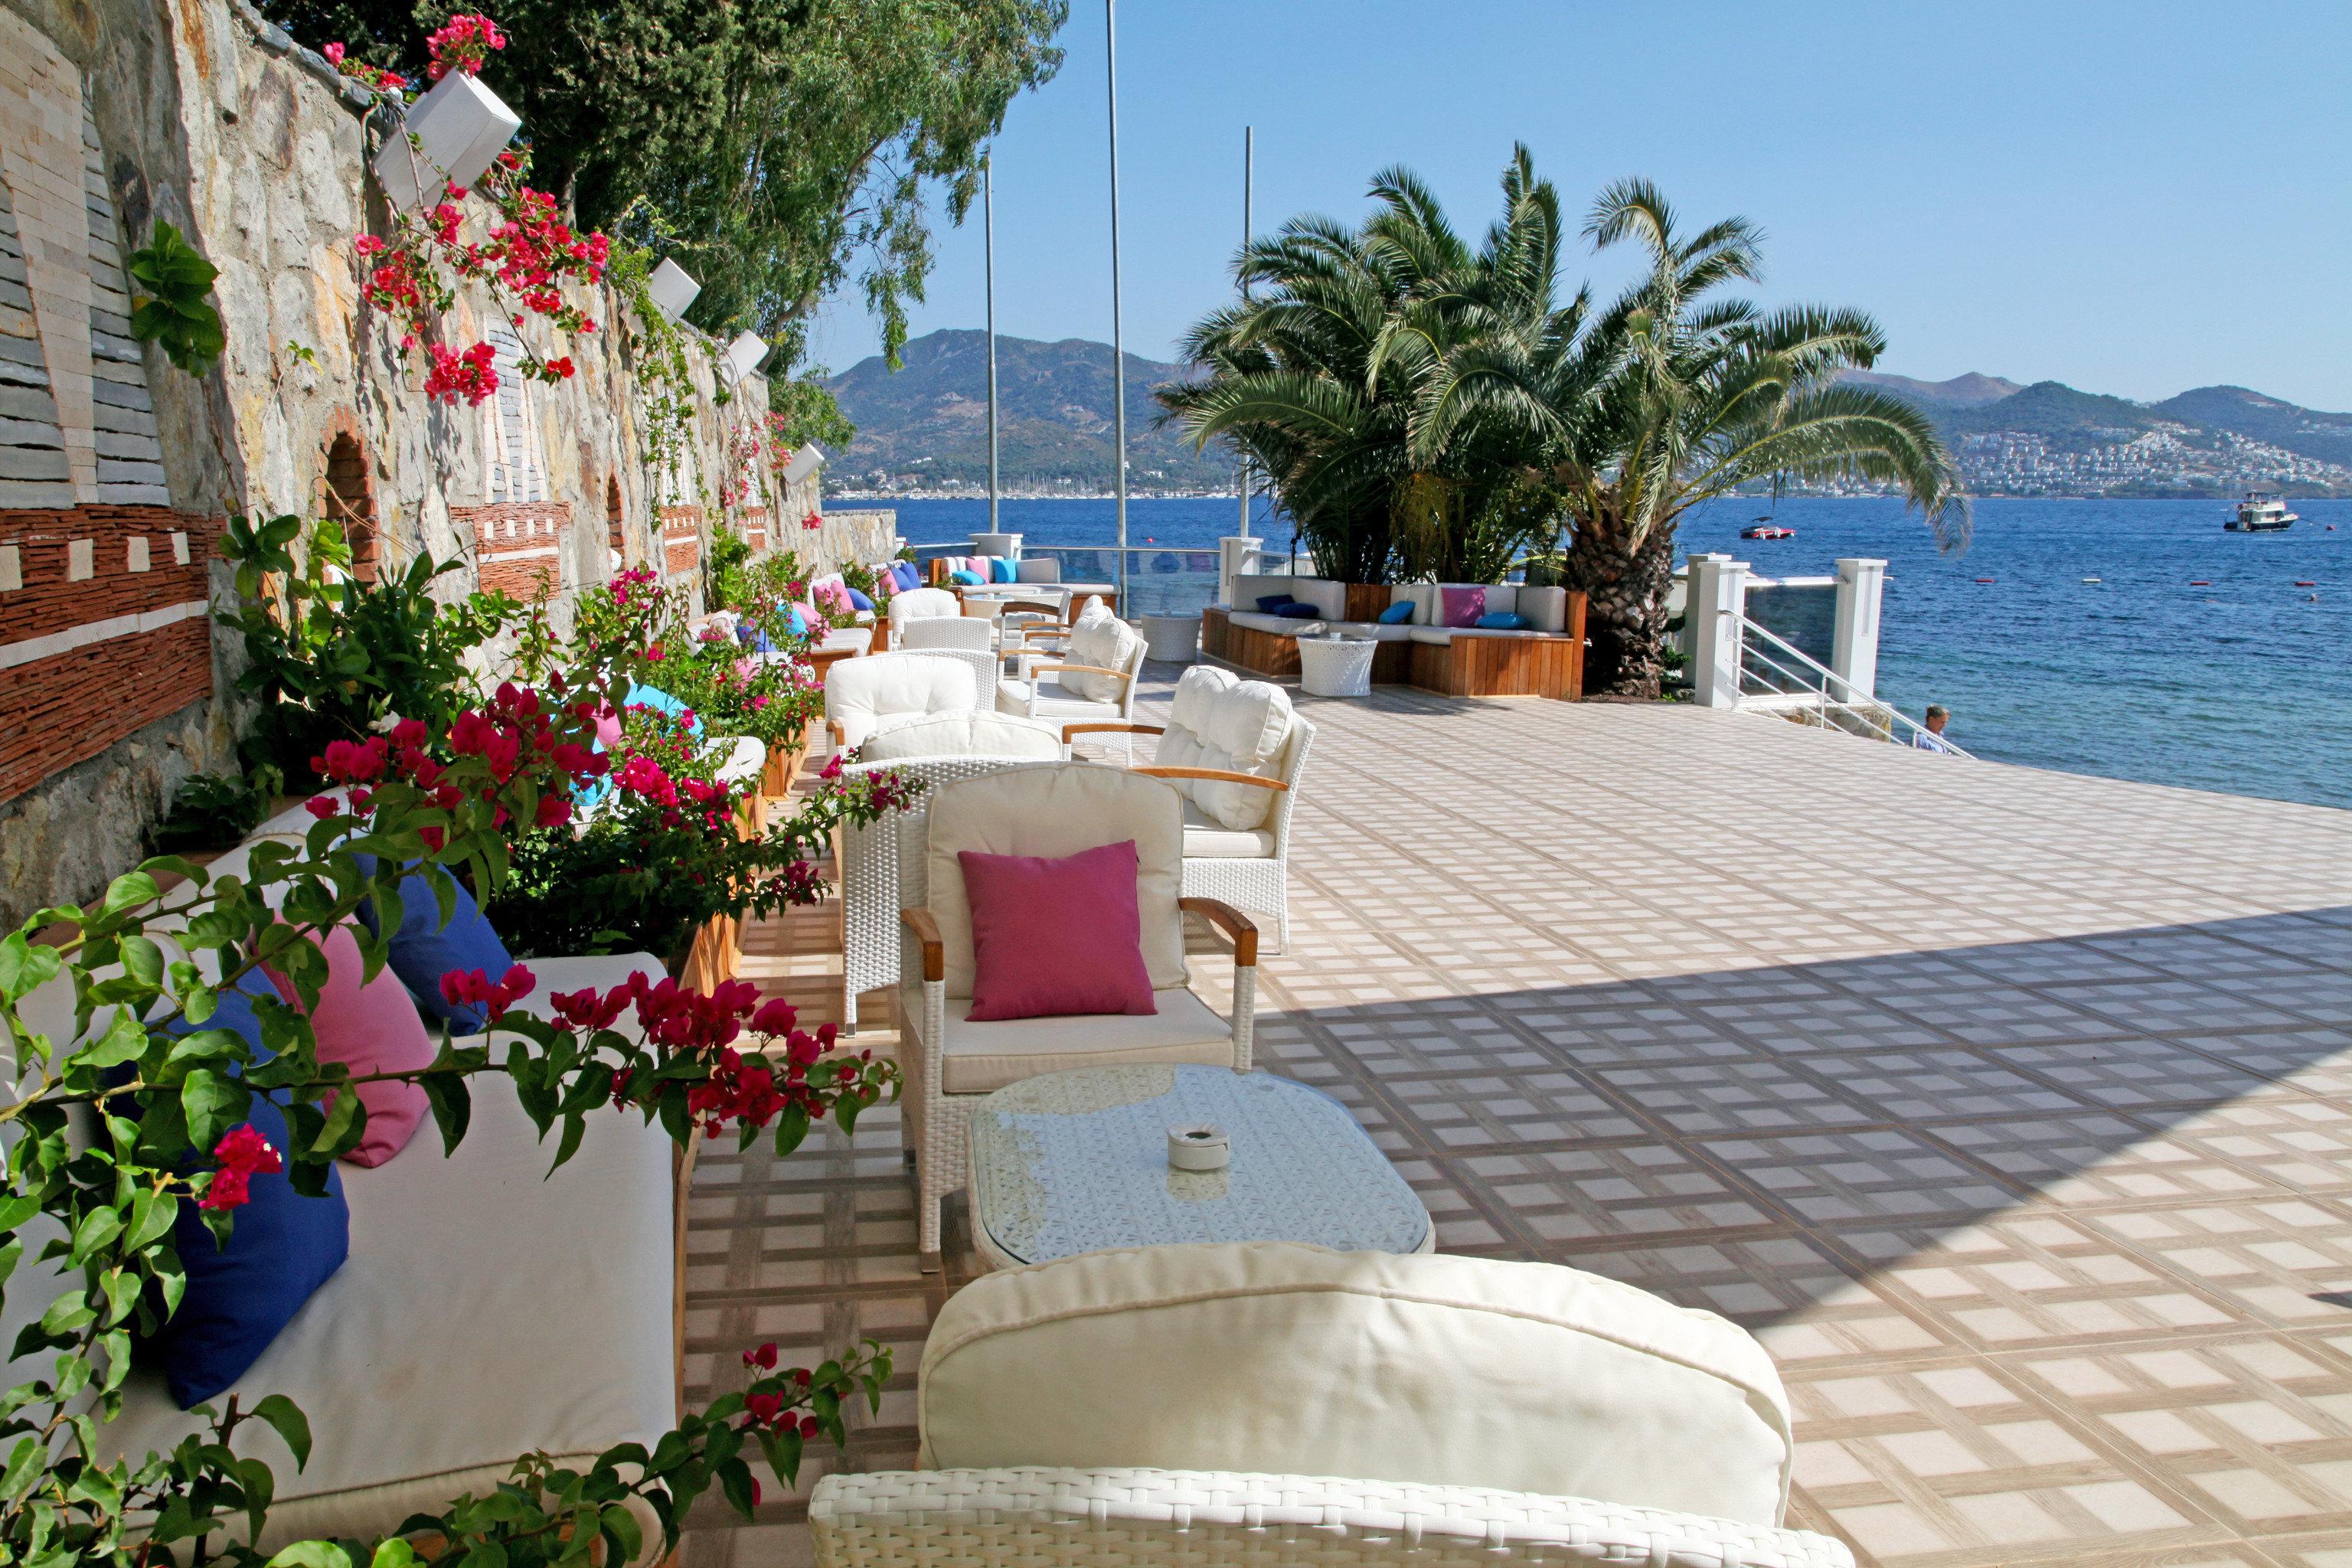 Balcony Lounge Modern Patio Terrace Waterfront property Resort Villa cottage walkway swimming pool